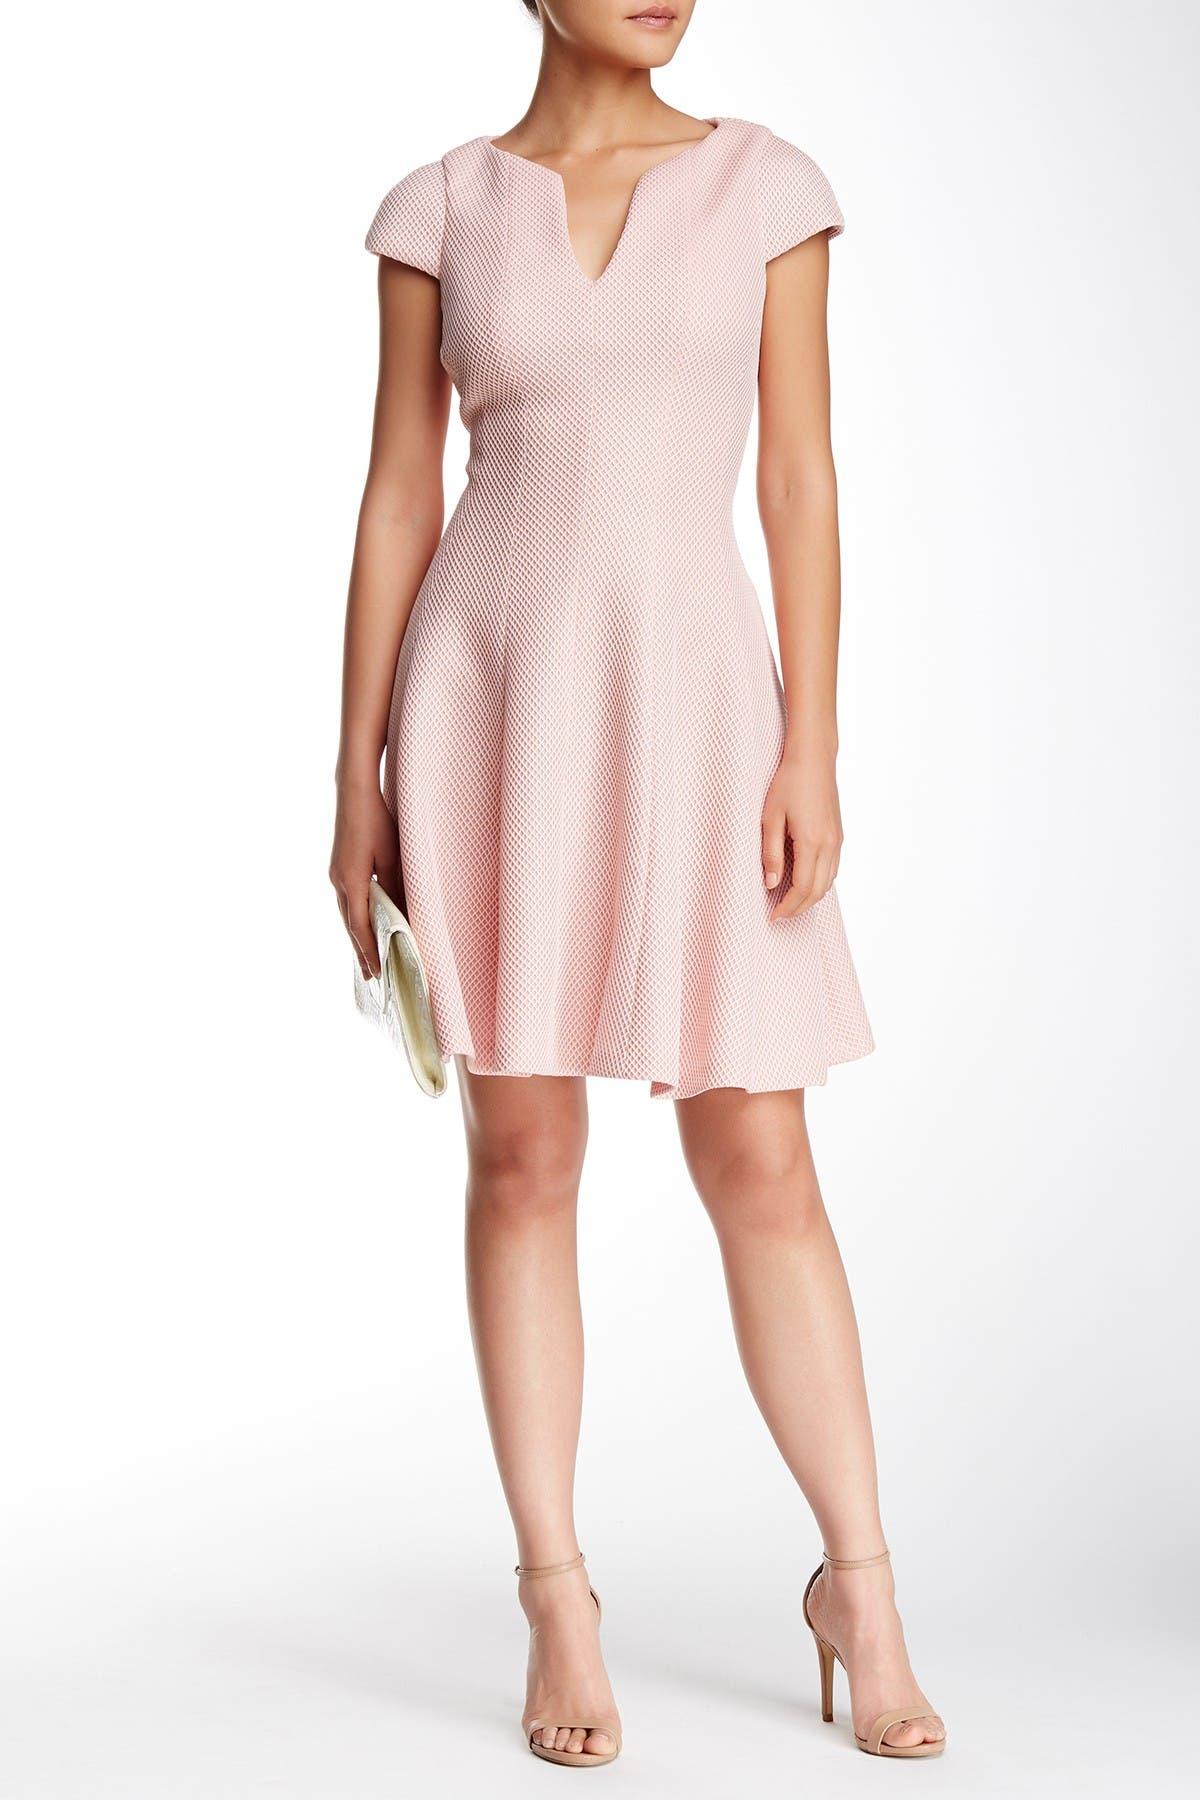 Image of Julia Jordan Cap Sleeve Textured Dress